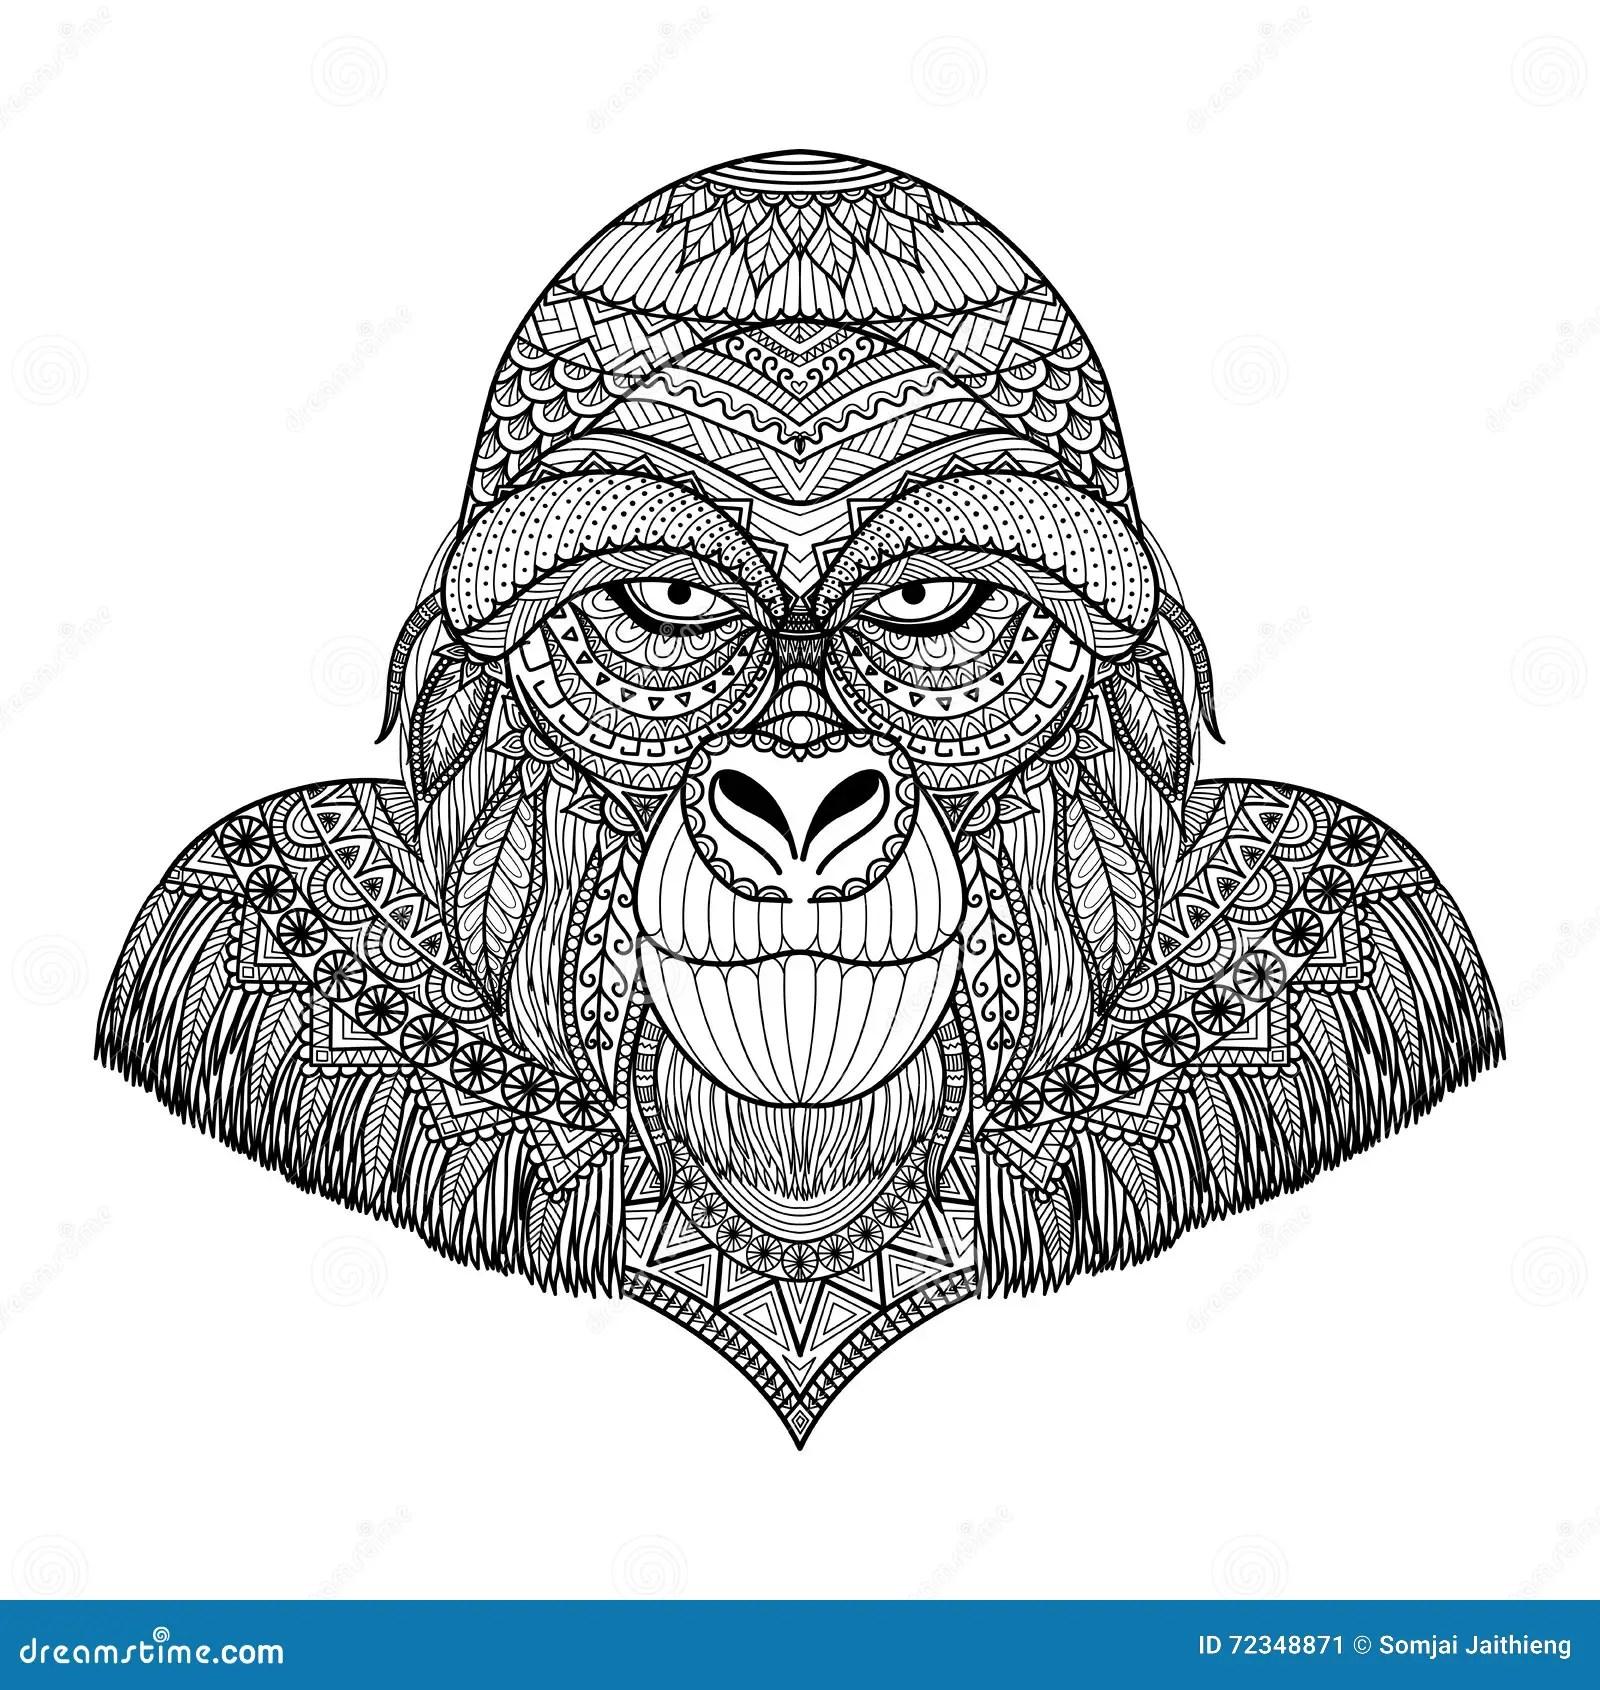 Clean Lines Doodle Design Of Gorilla Head For Adult